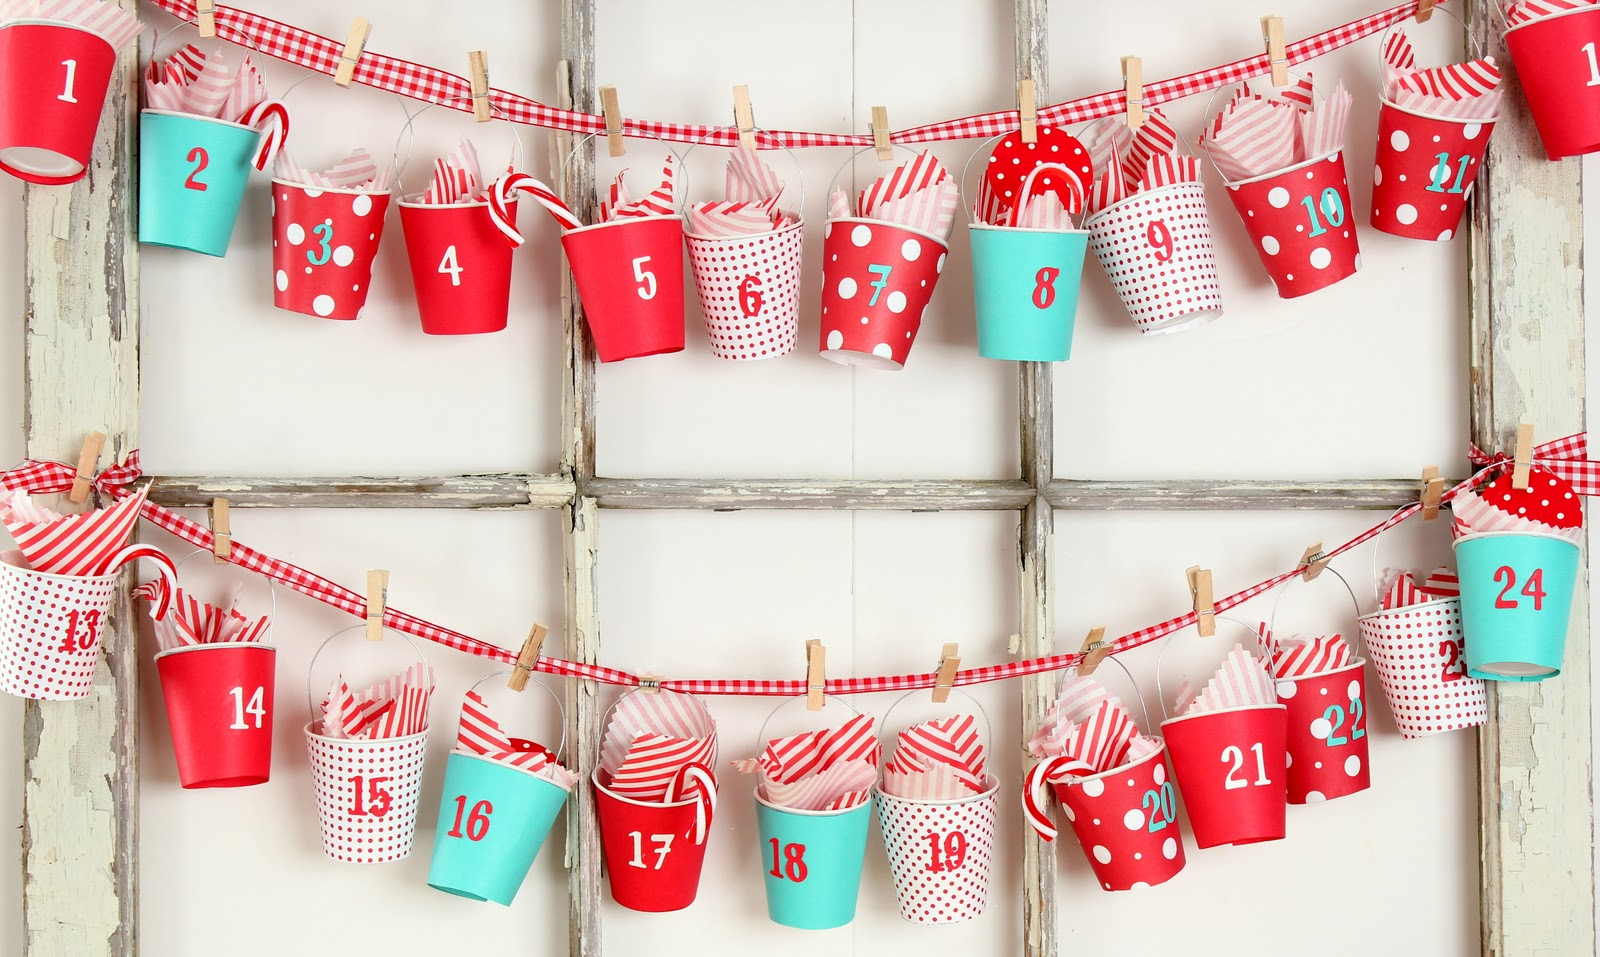 Адвент календарь2